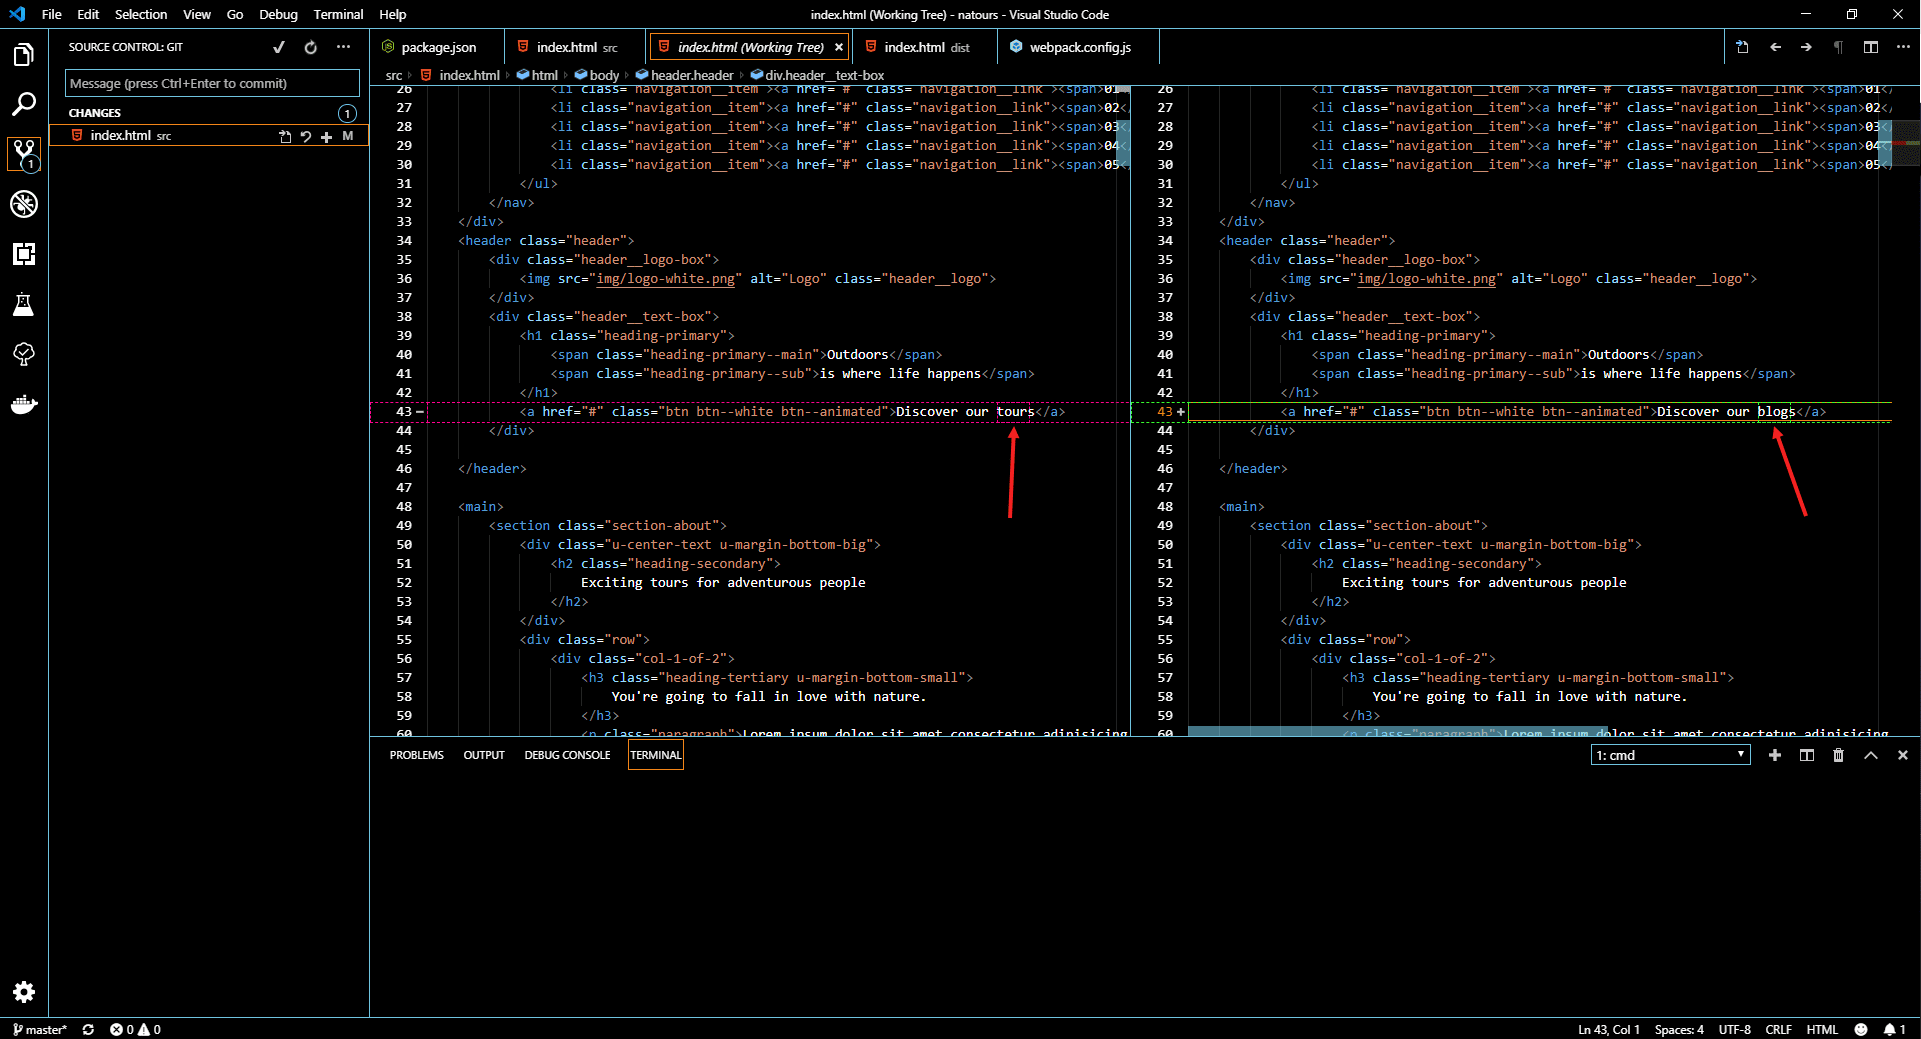 Source code change